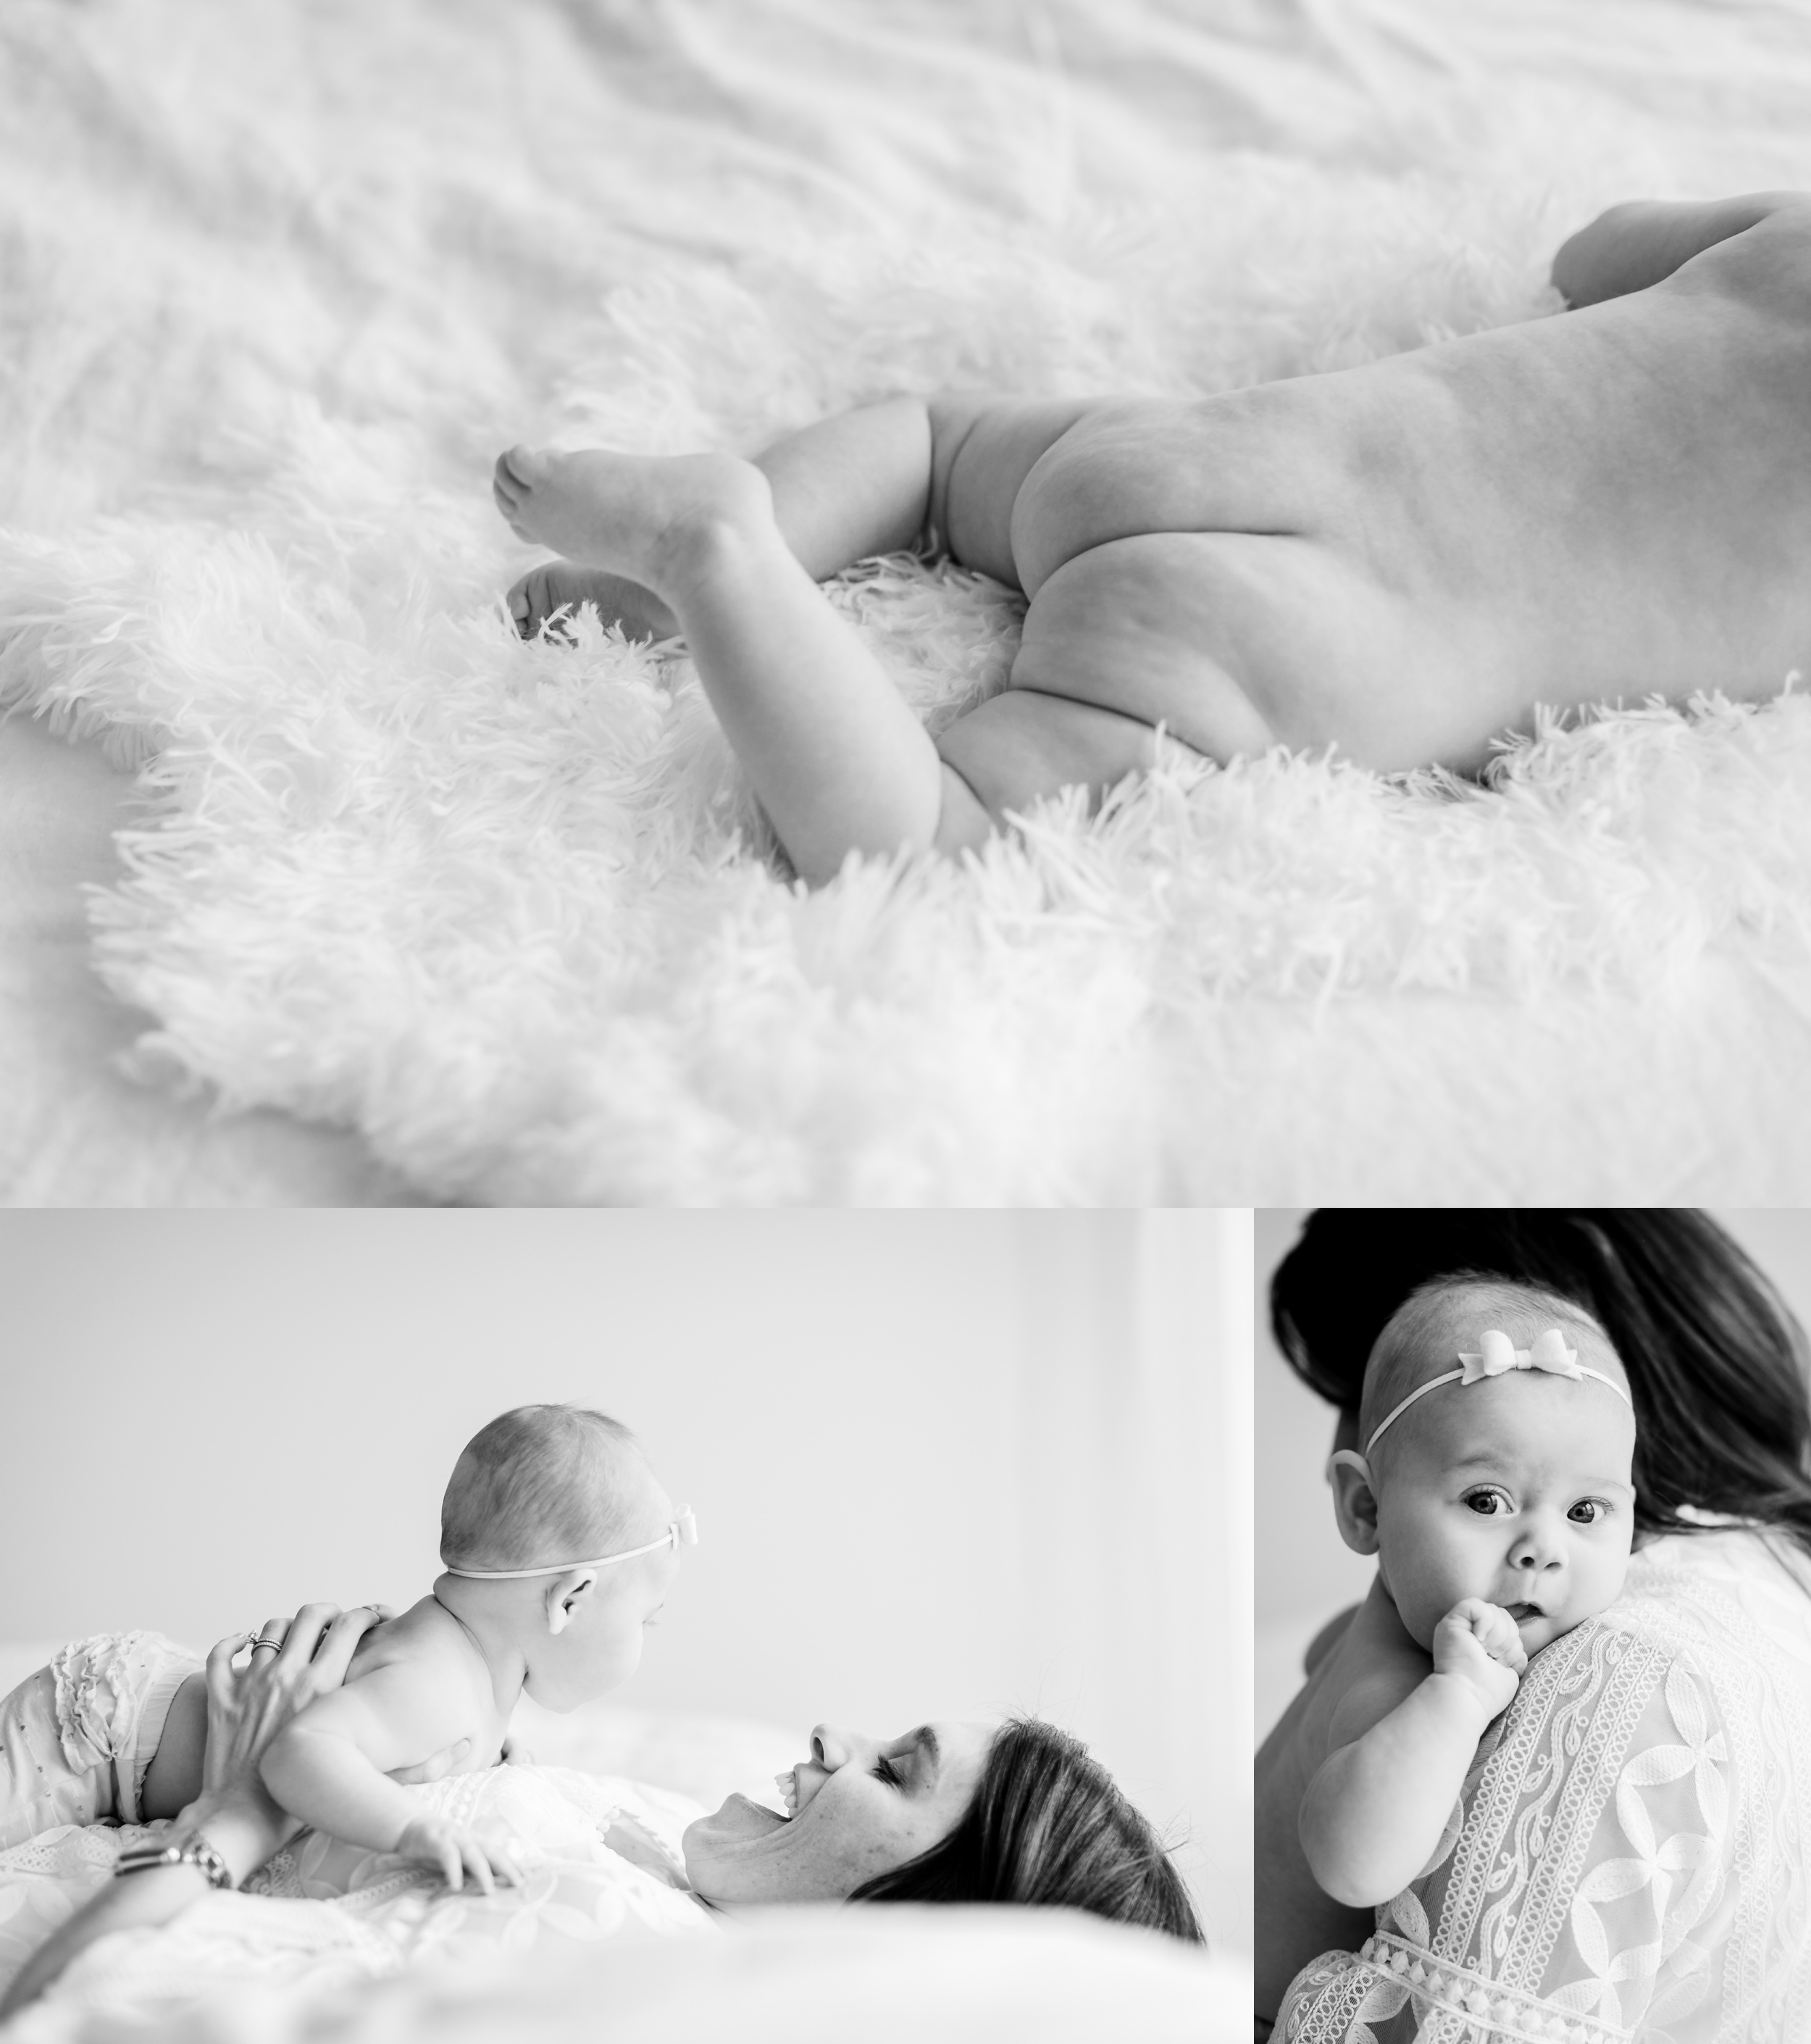 chicago lifestyle baby photographer jenny grimm simple studio milestone session